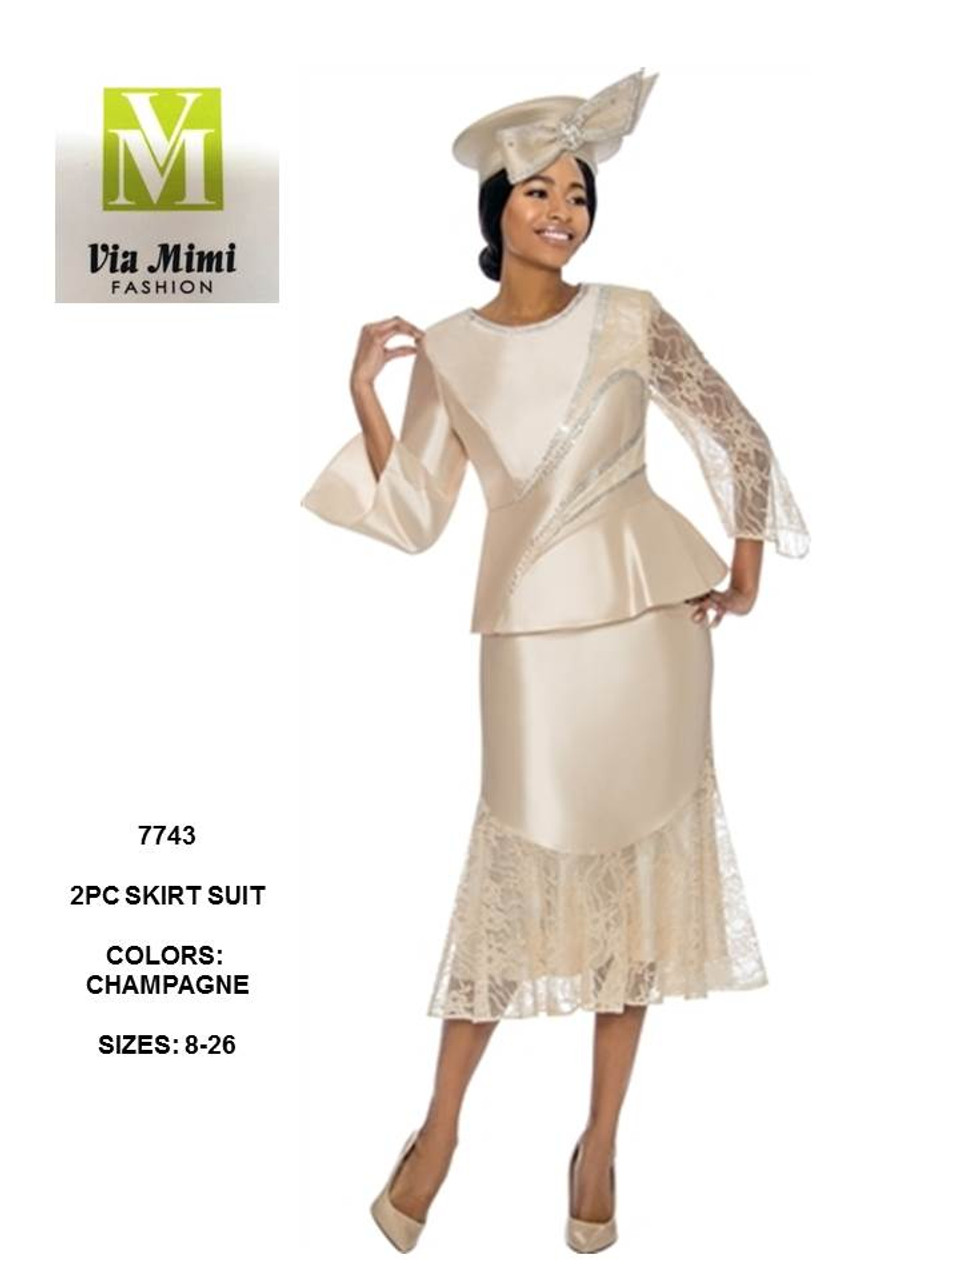 9f588c06369b6 TERRAMINA - 7743 - EMBELLISHED 2PC SKIRT SUIT - SIZES  8-26 - COLOR   CHAMPAGNE - Via Mimi Fashion